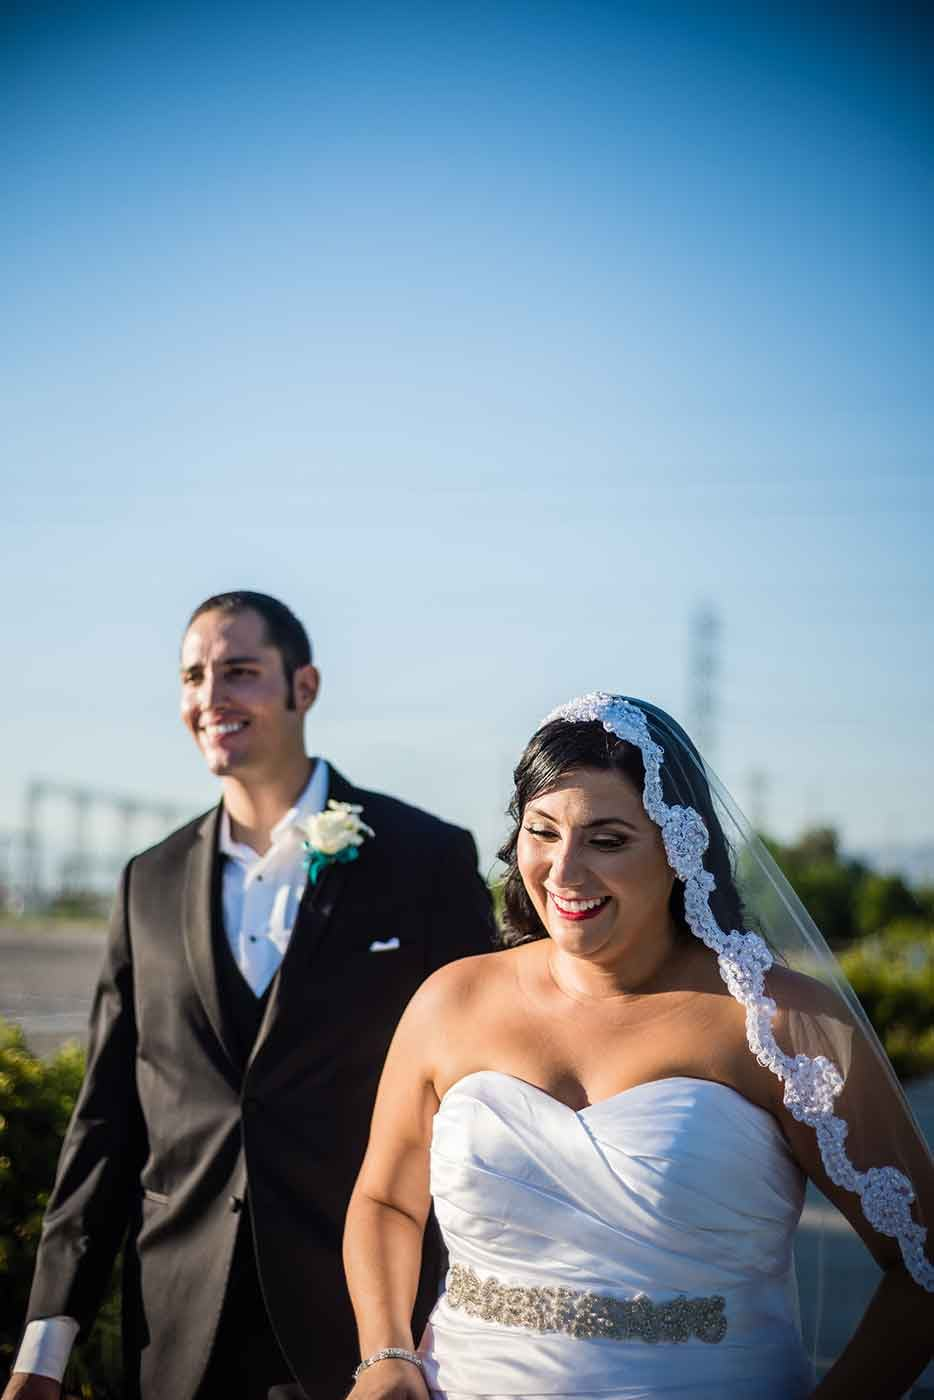 smlStef-+-Andy---Wed-Sept-25,-2015-433.jpg